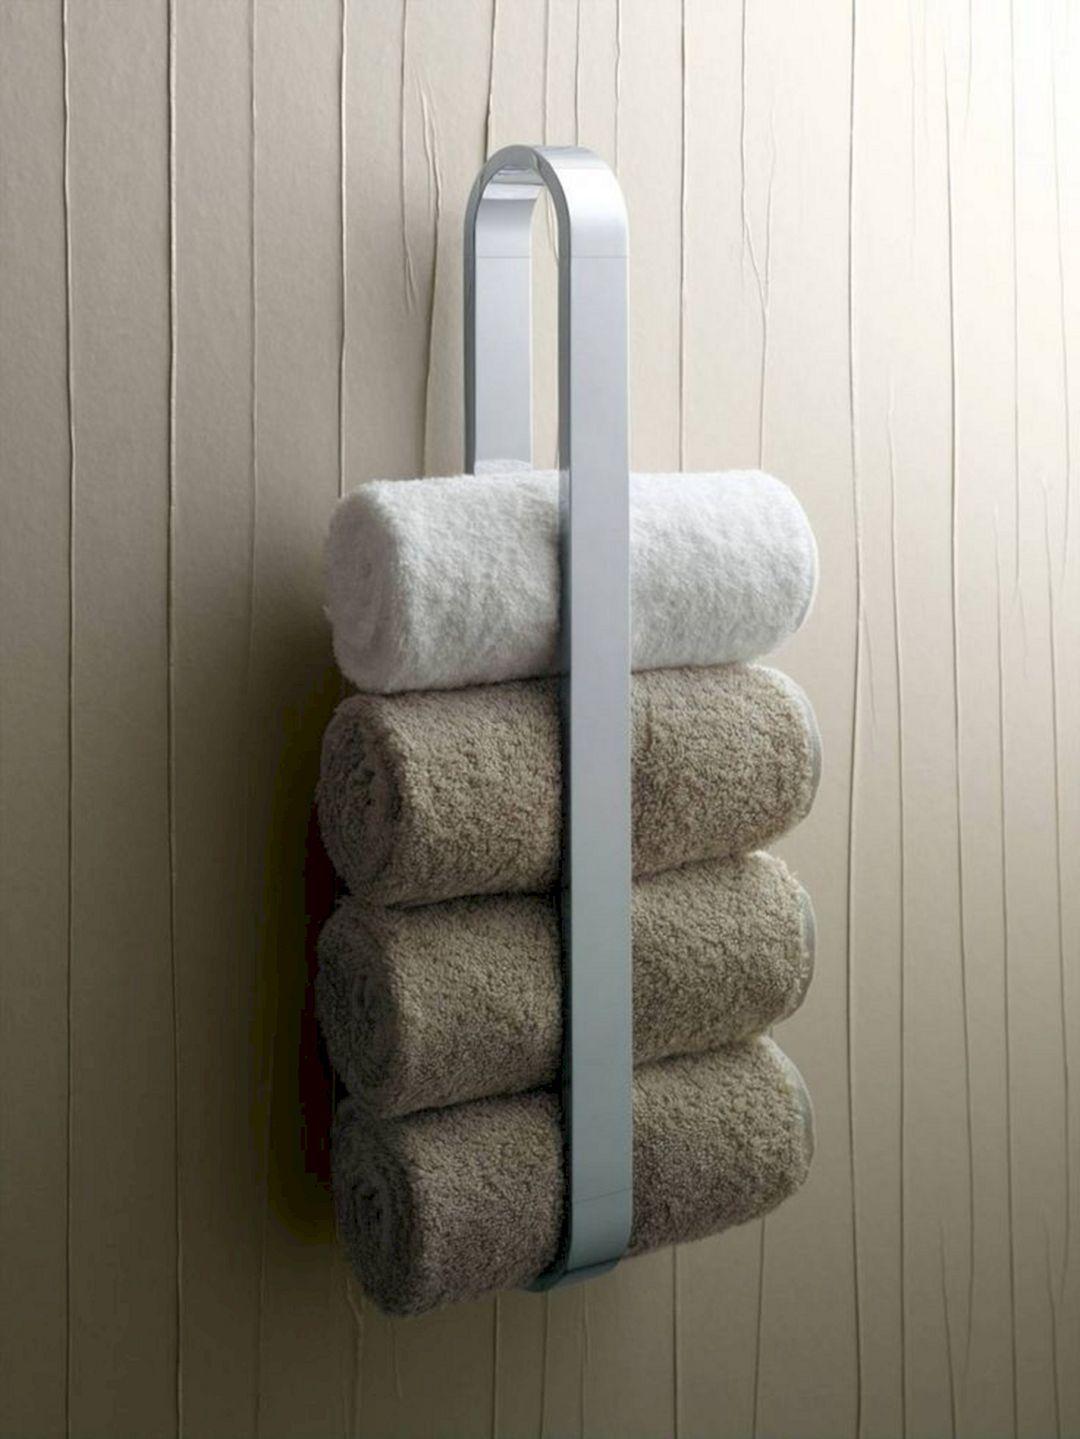 24 Marvelous Bathroom Storage Ideas For Small Space Bathroom